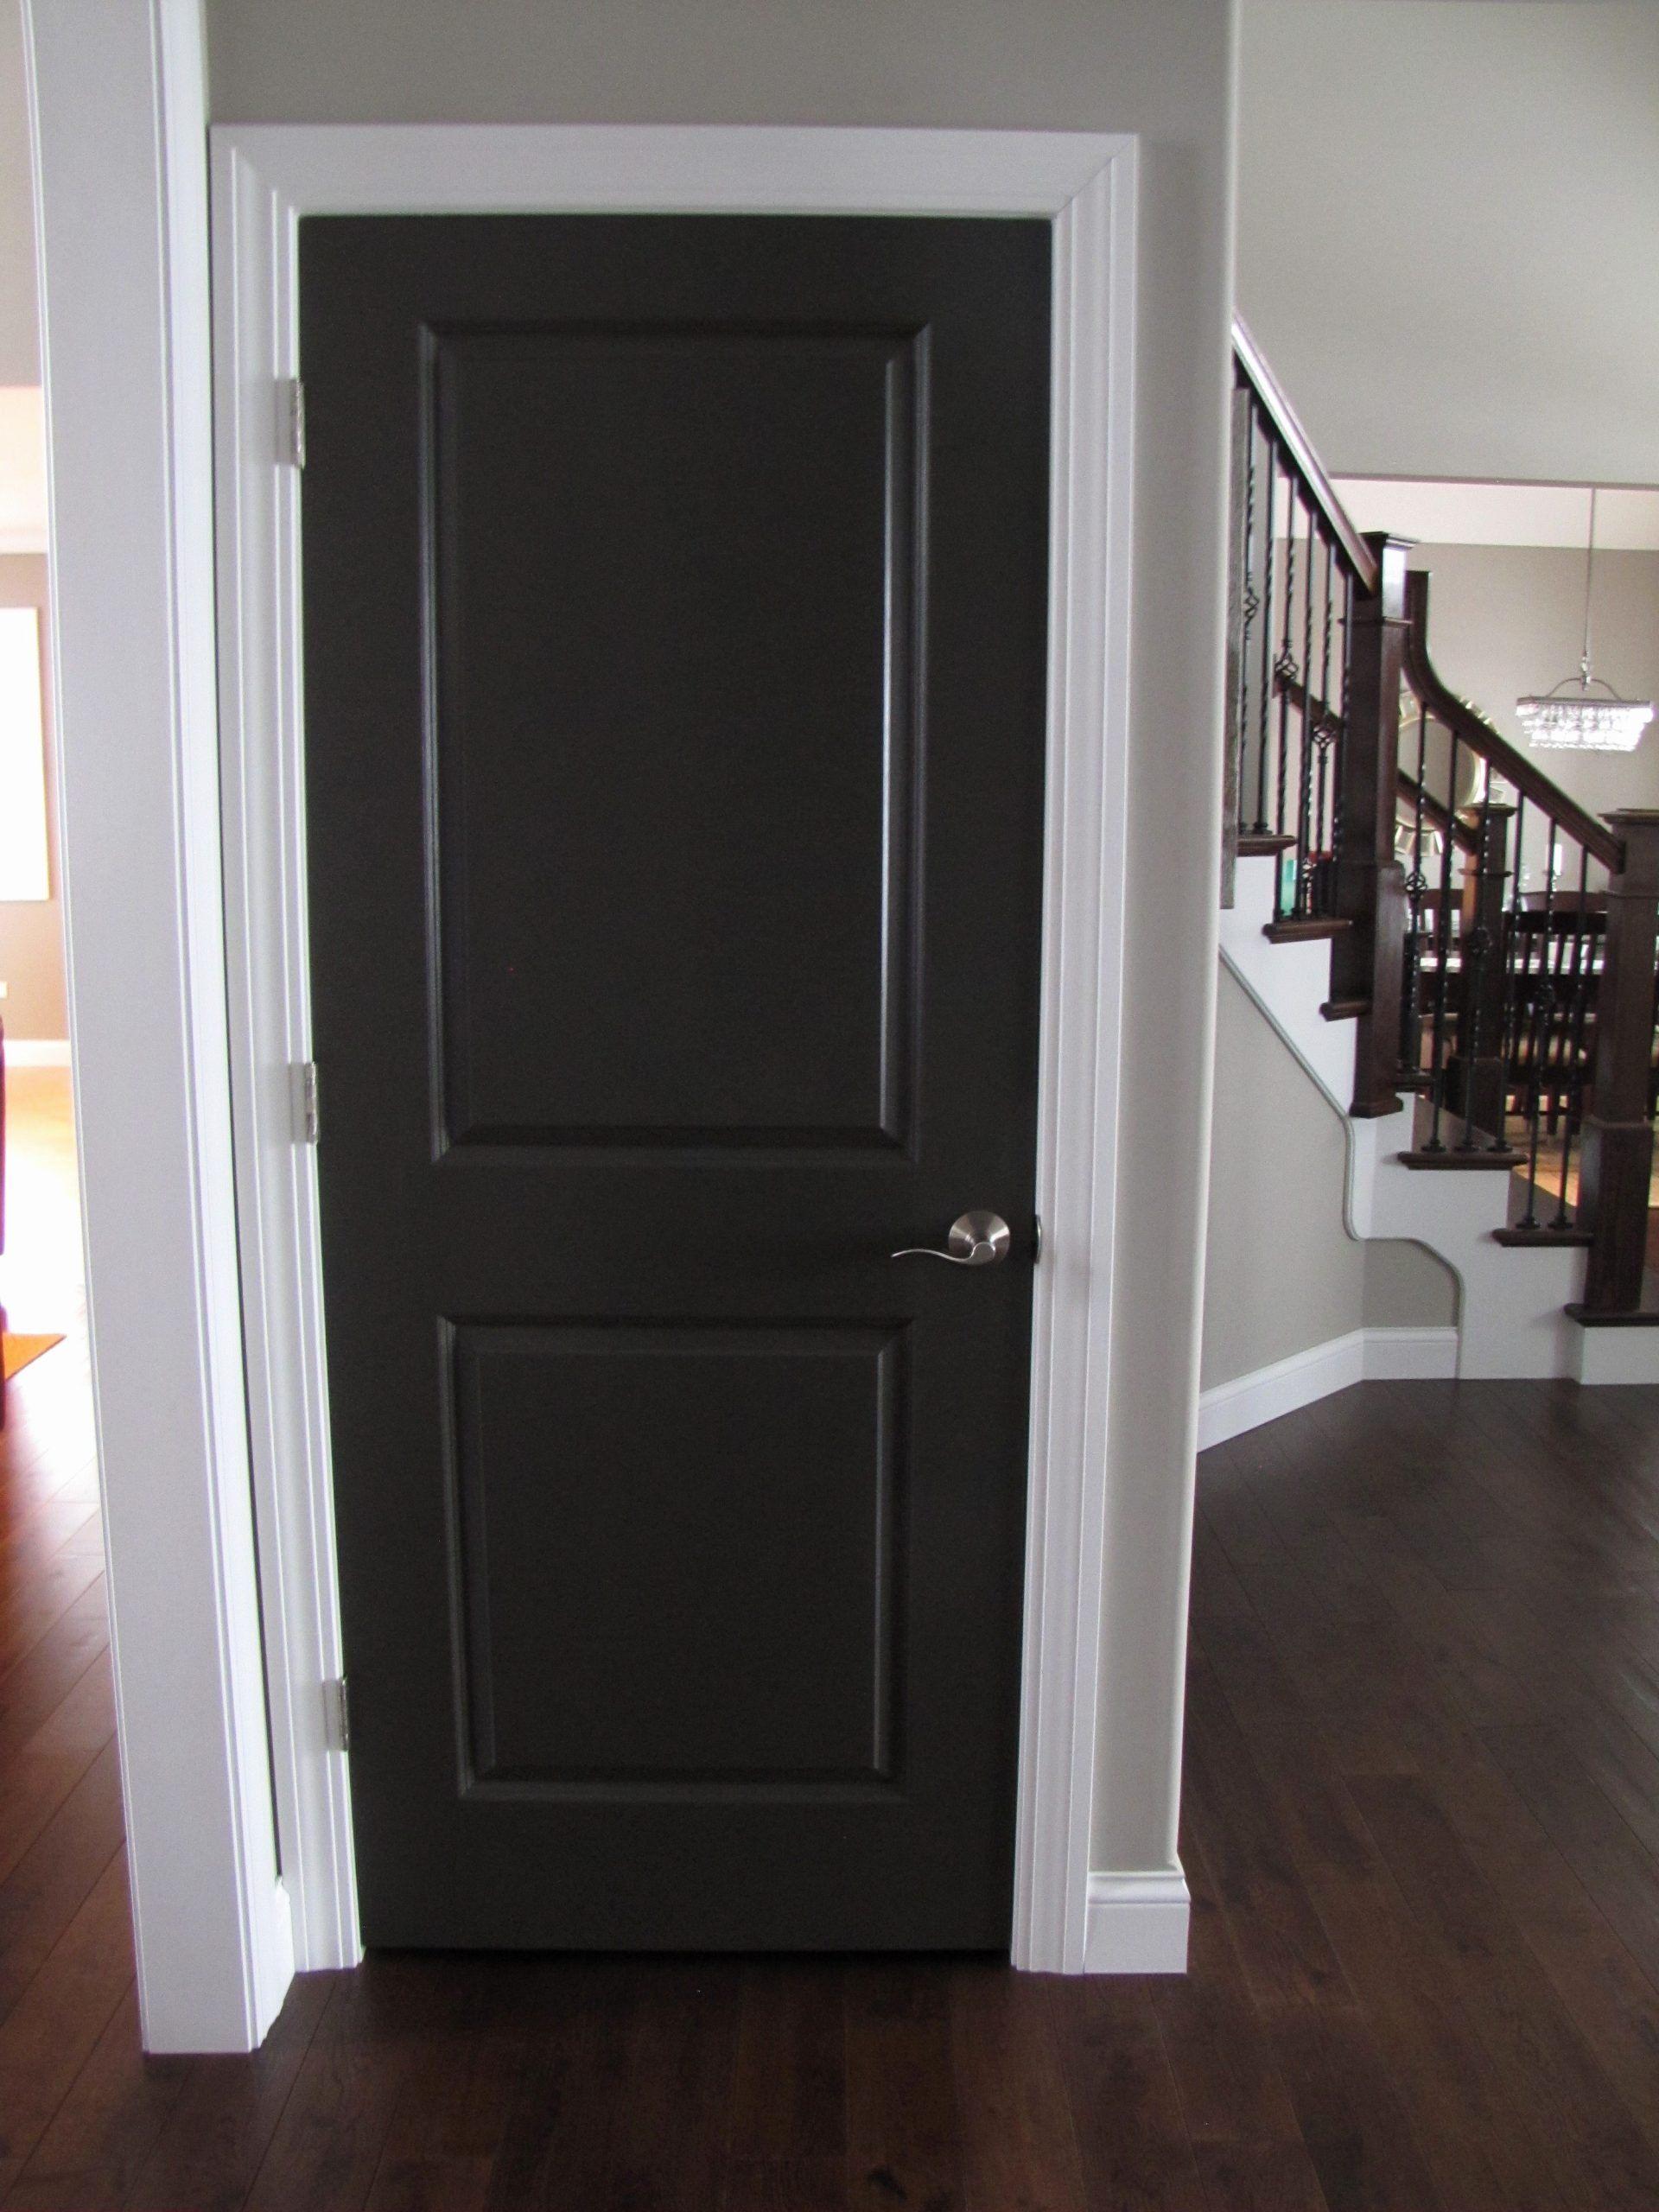 Wood Bedroom Doors Lowes Fresh Home Tips Interior Doors Lowes for